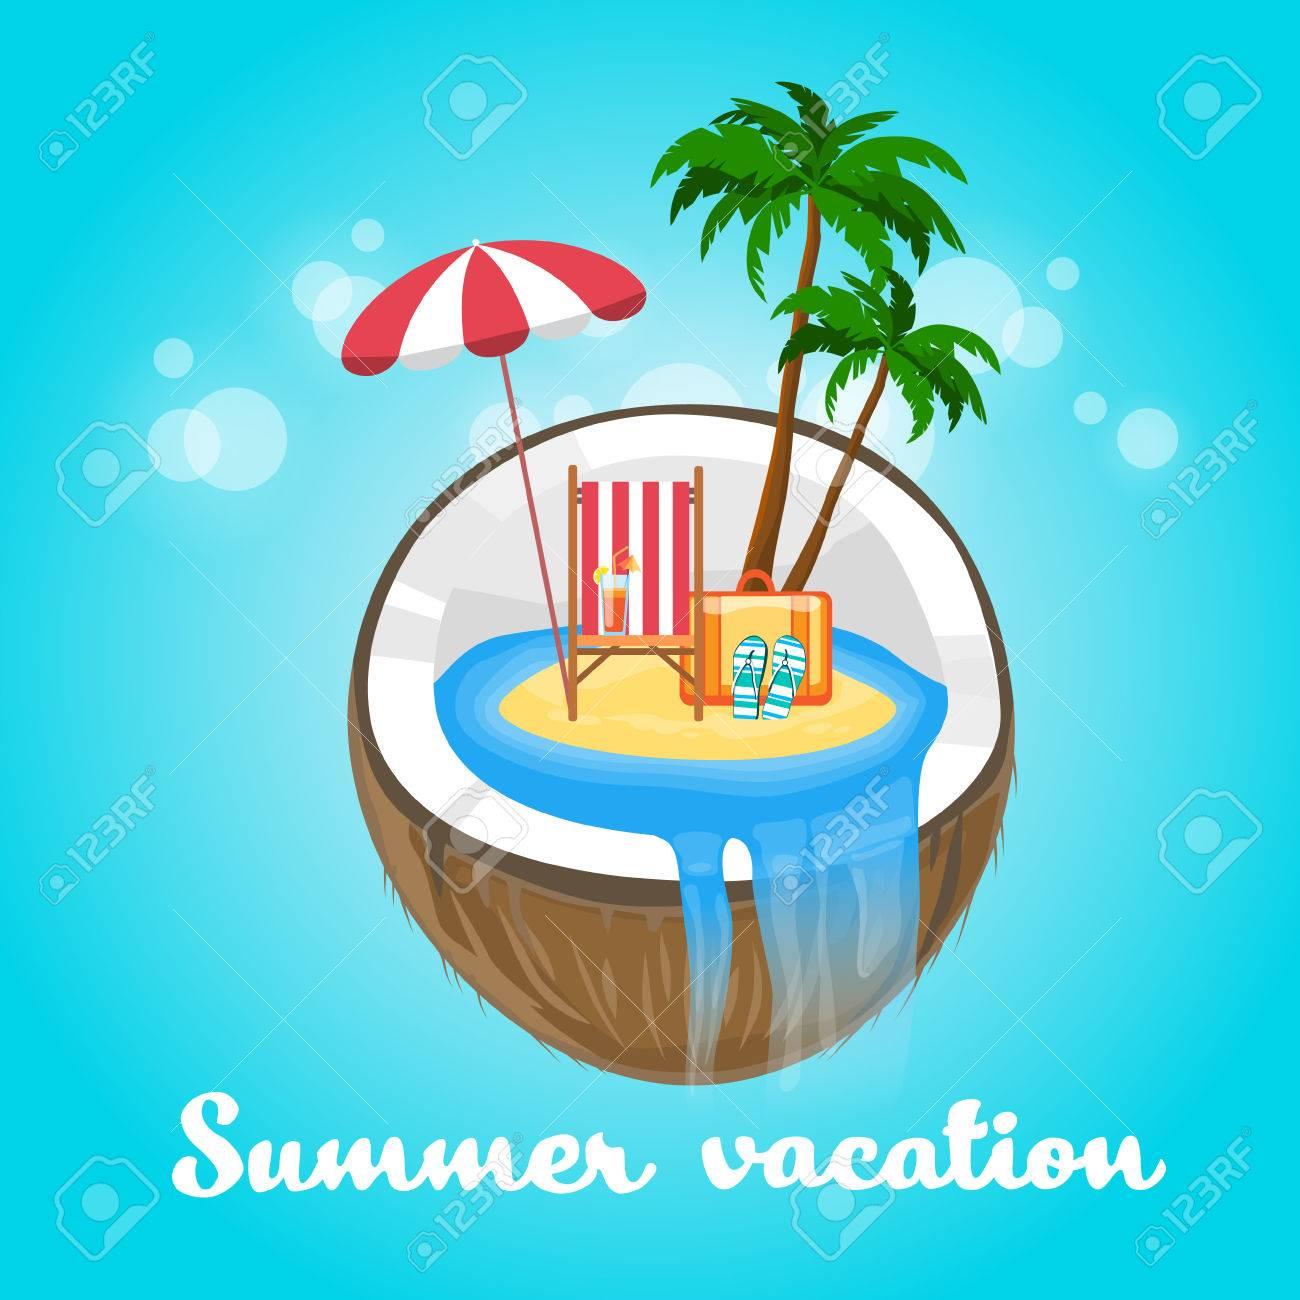 Coconut Tropical Island Summer Beach Vacation Concept Flat Vector